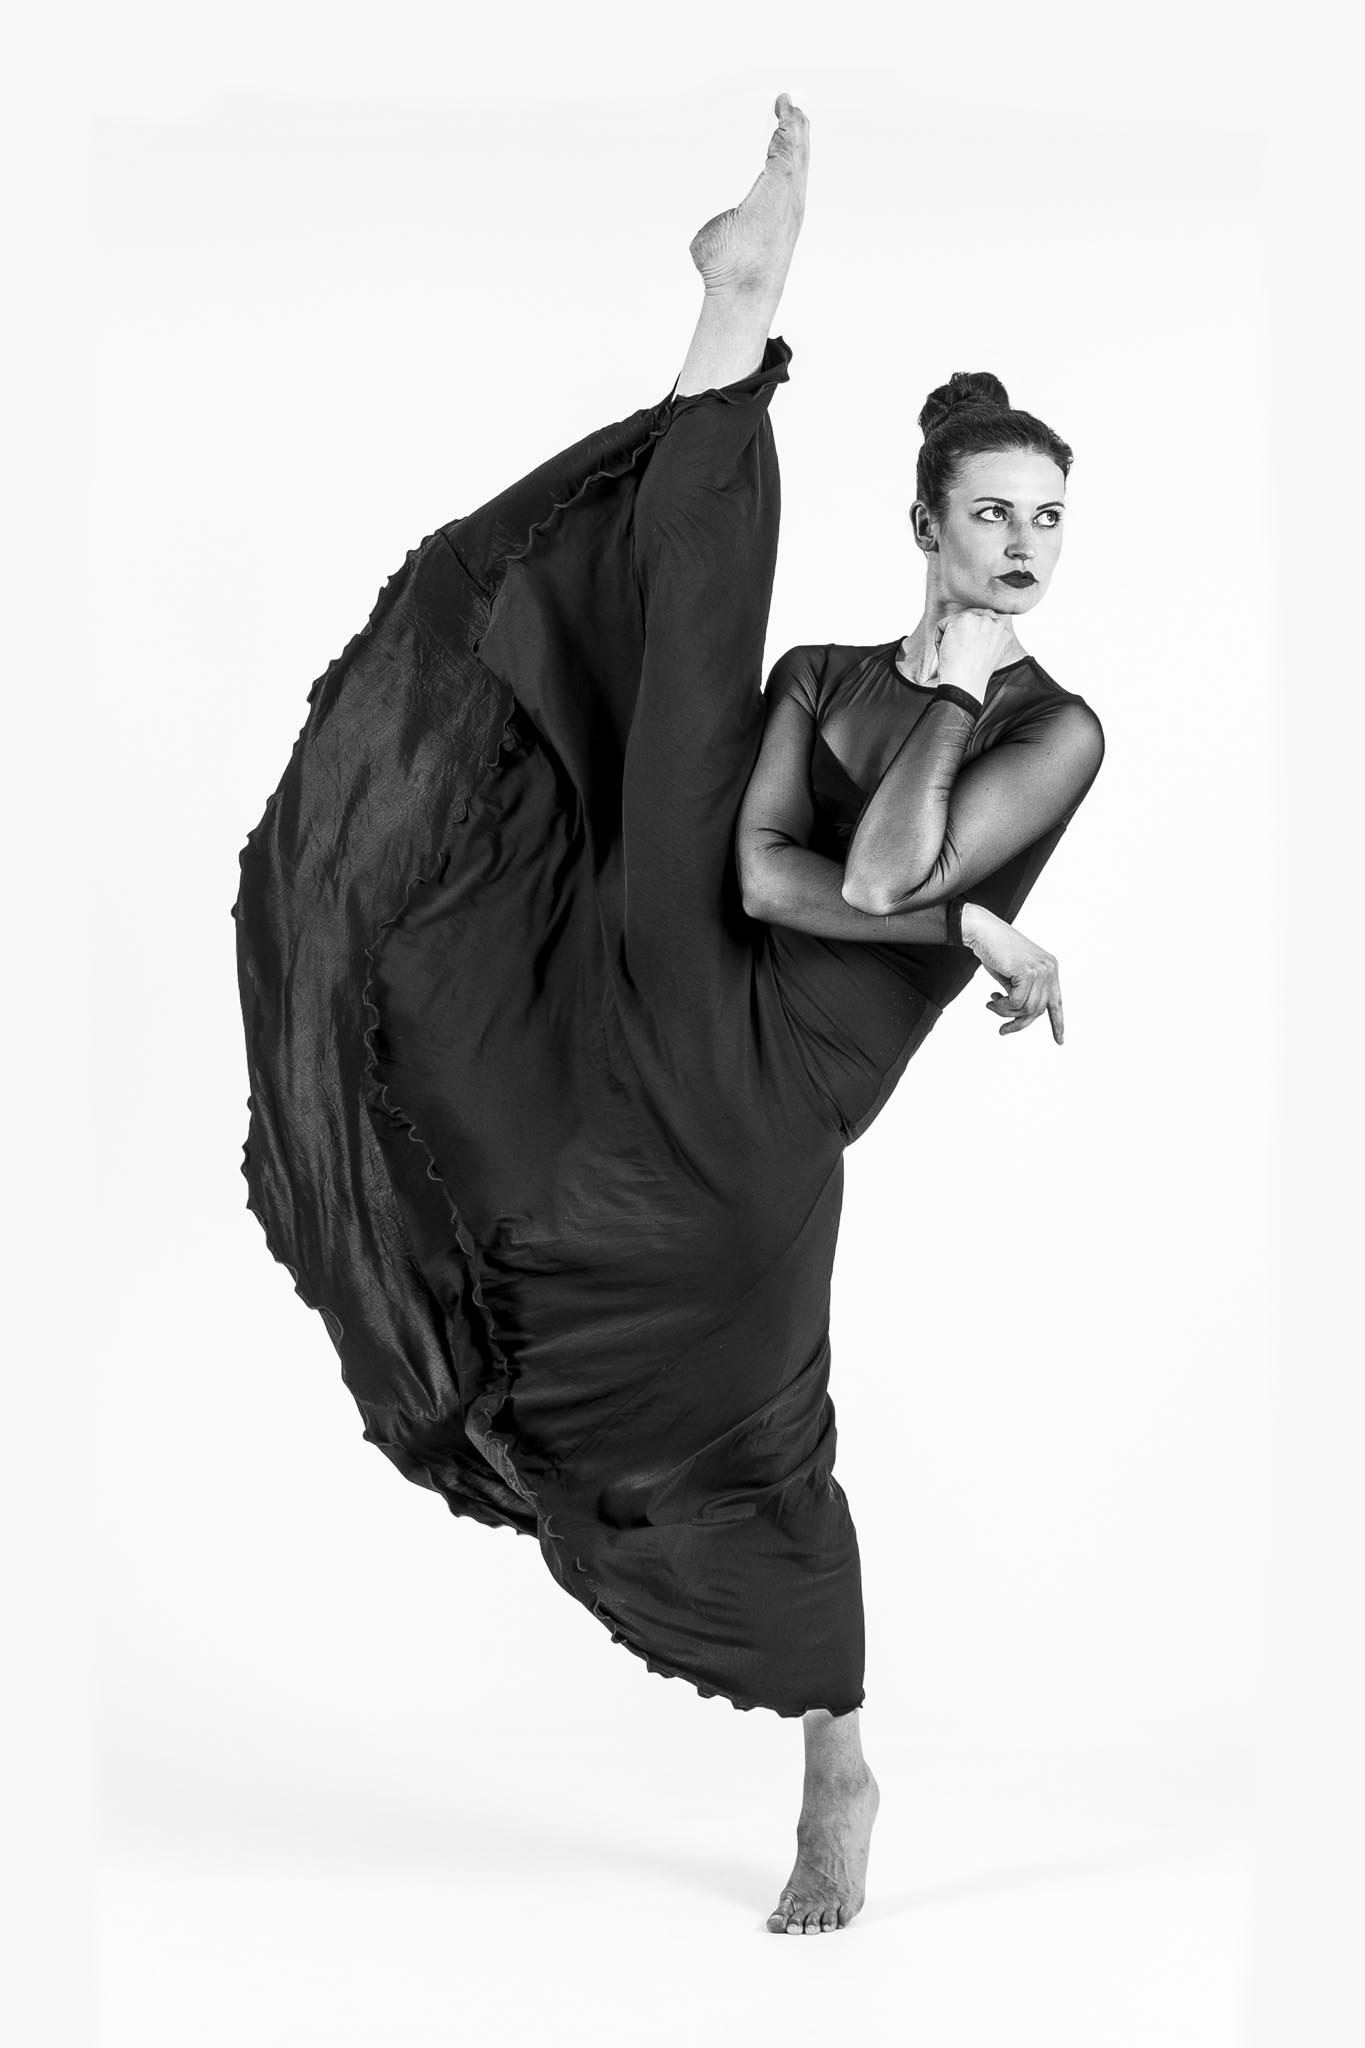 Fotoclub Wolfratshausen_B1_Ilmberger Andy_Black Swan